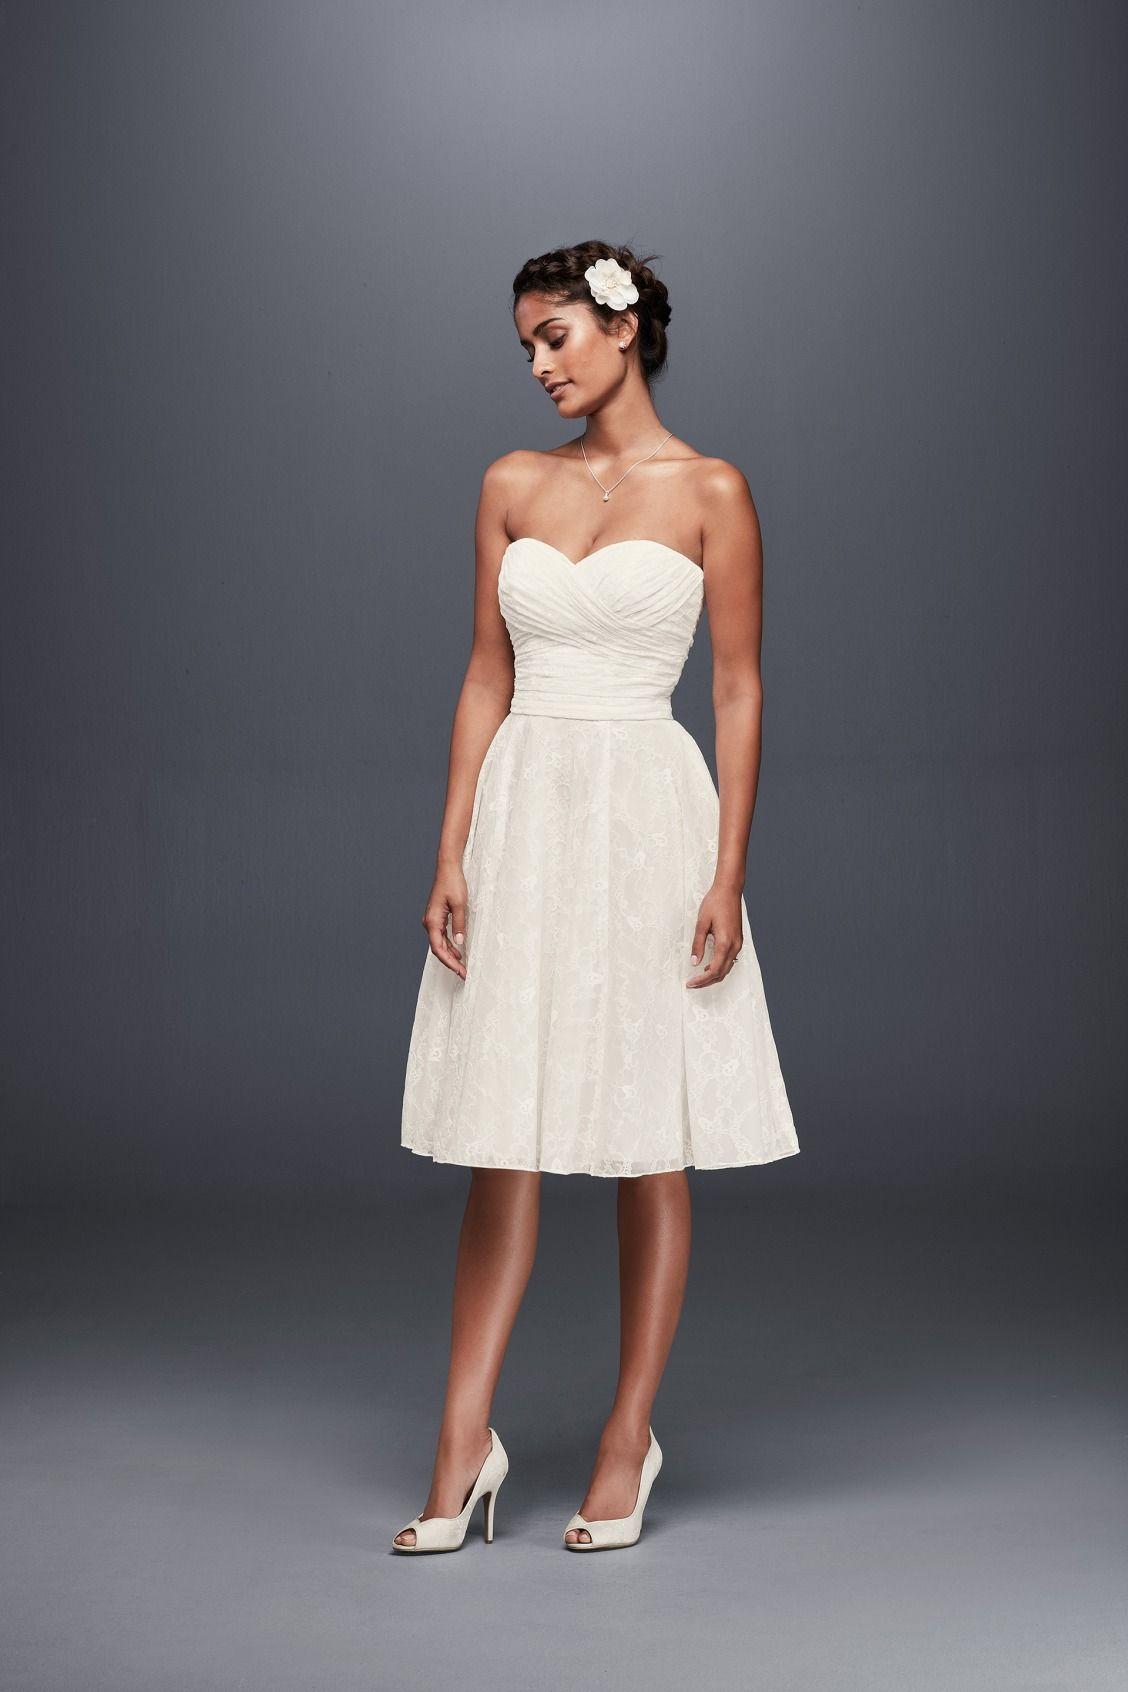 Strapless Lace Short Wedding Dress David S Bridal Simple Wedding Dress Strapless A Line Wedding Dress Strapless Lace Wedding Dress [ 1692 x 1128 Pixel ]